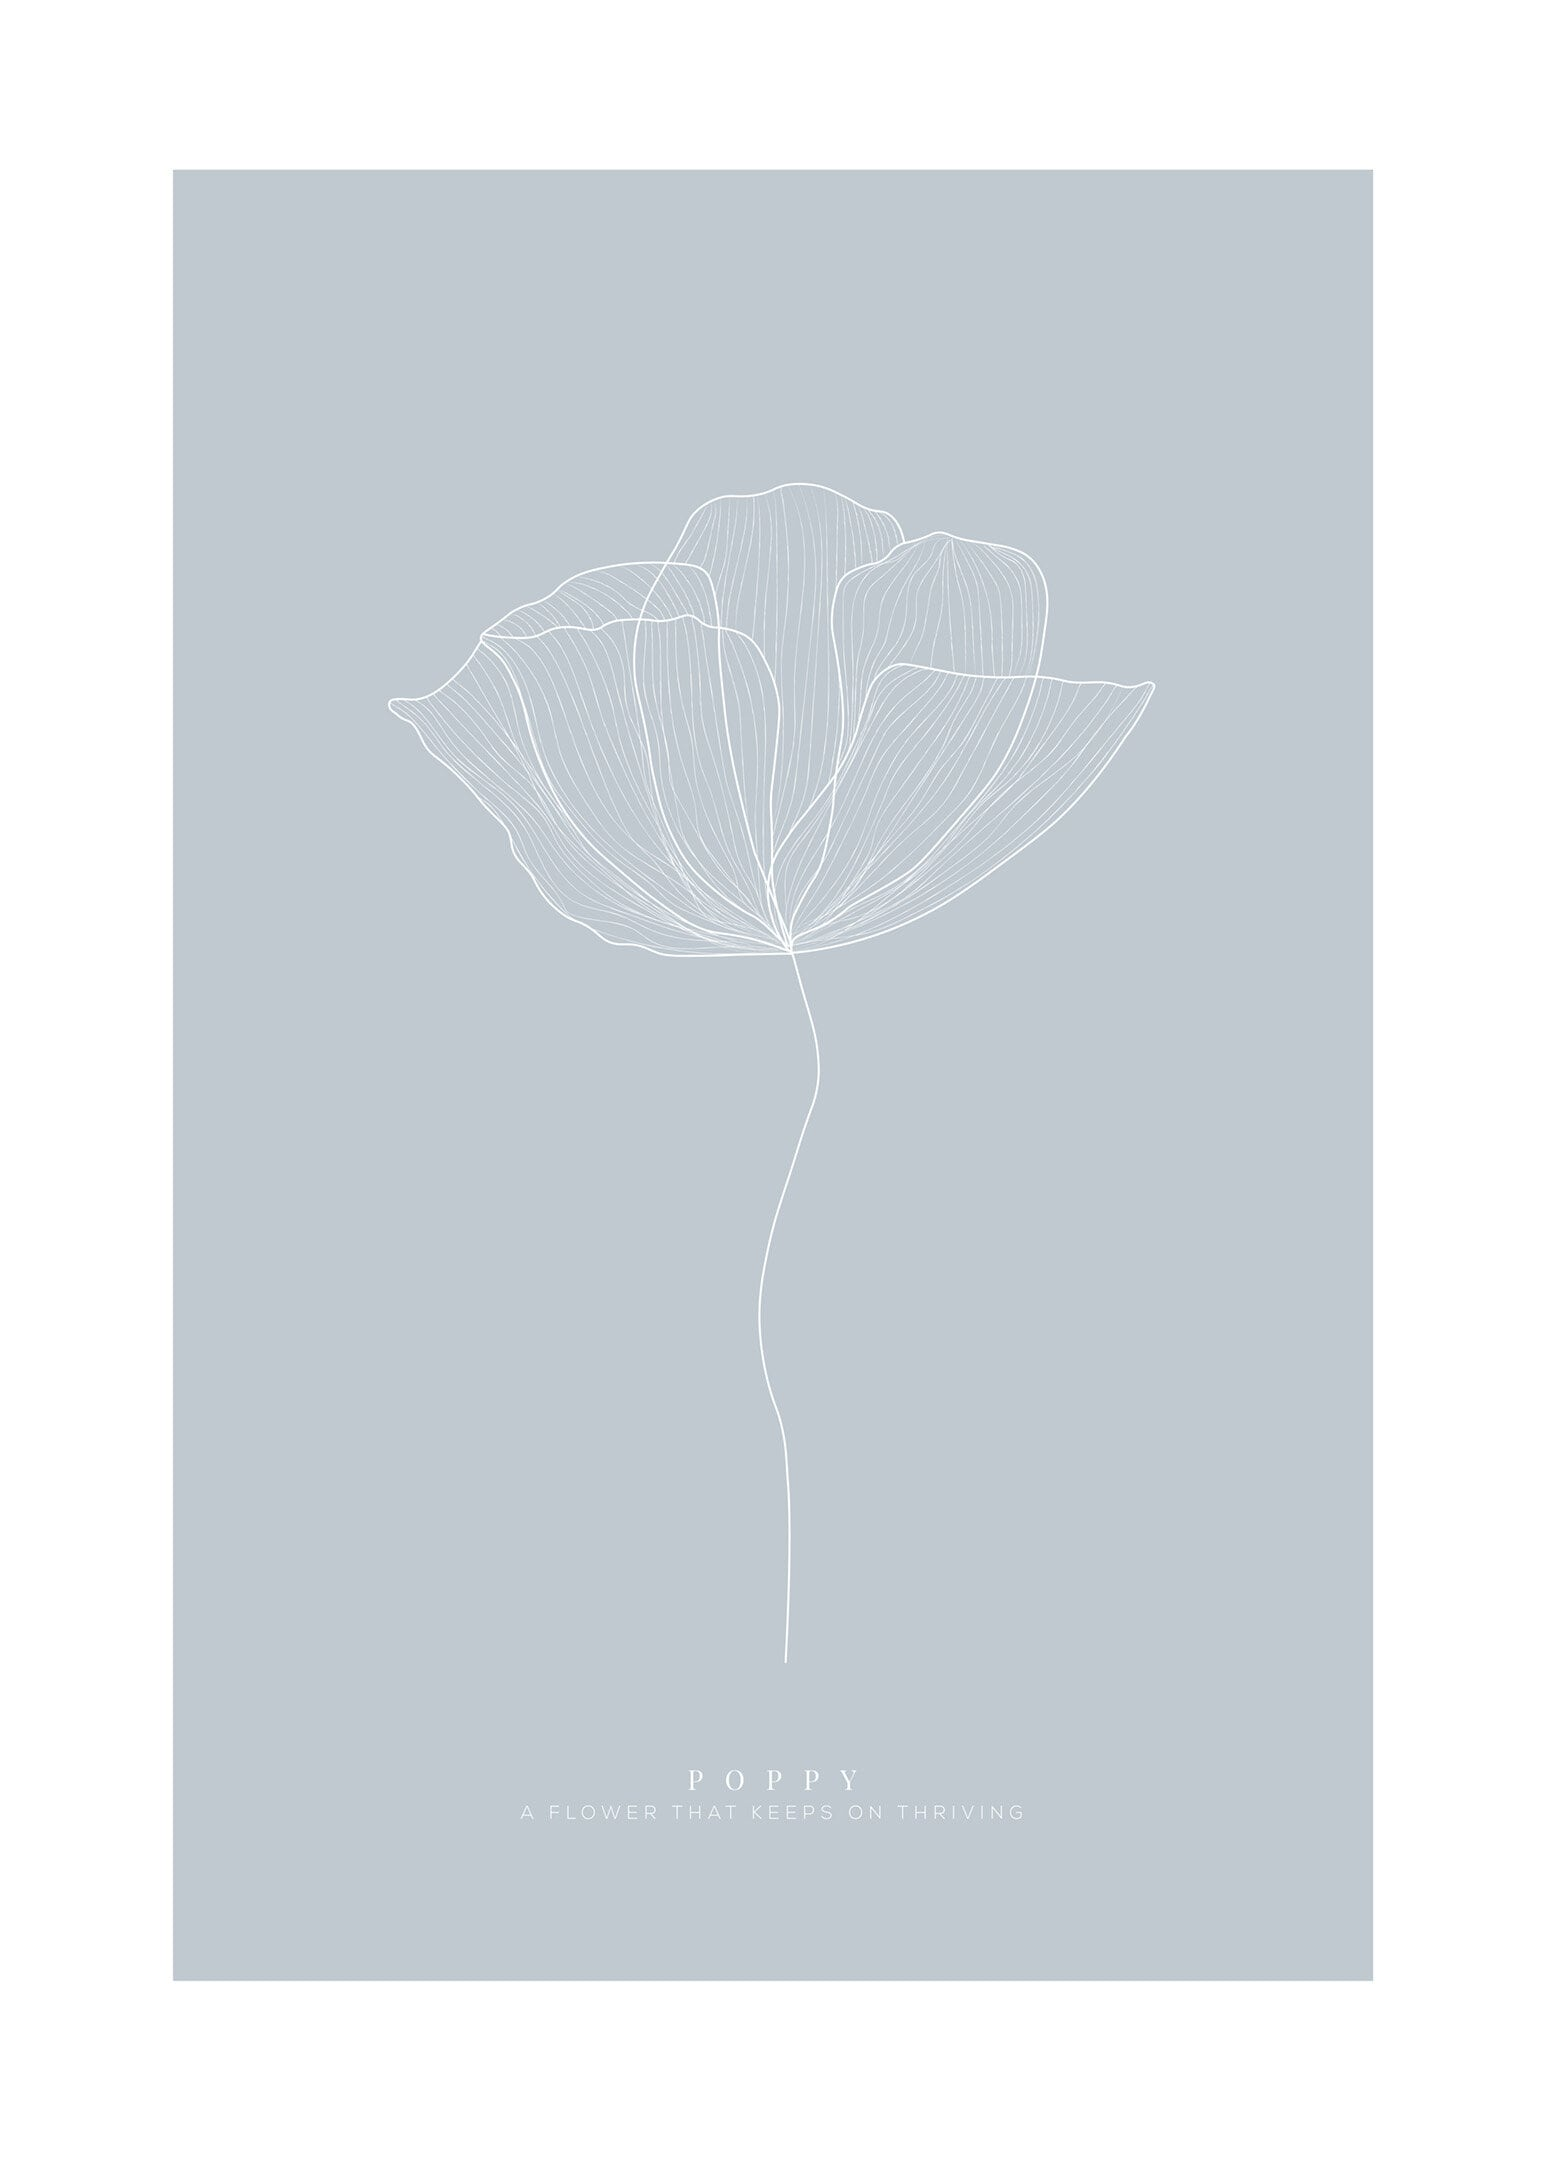 Poppy ljusblå poster